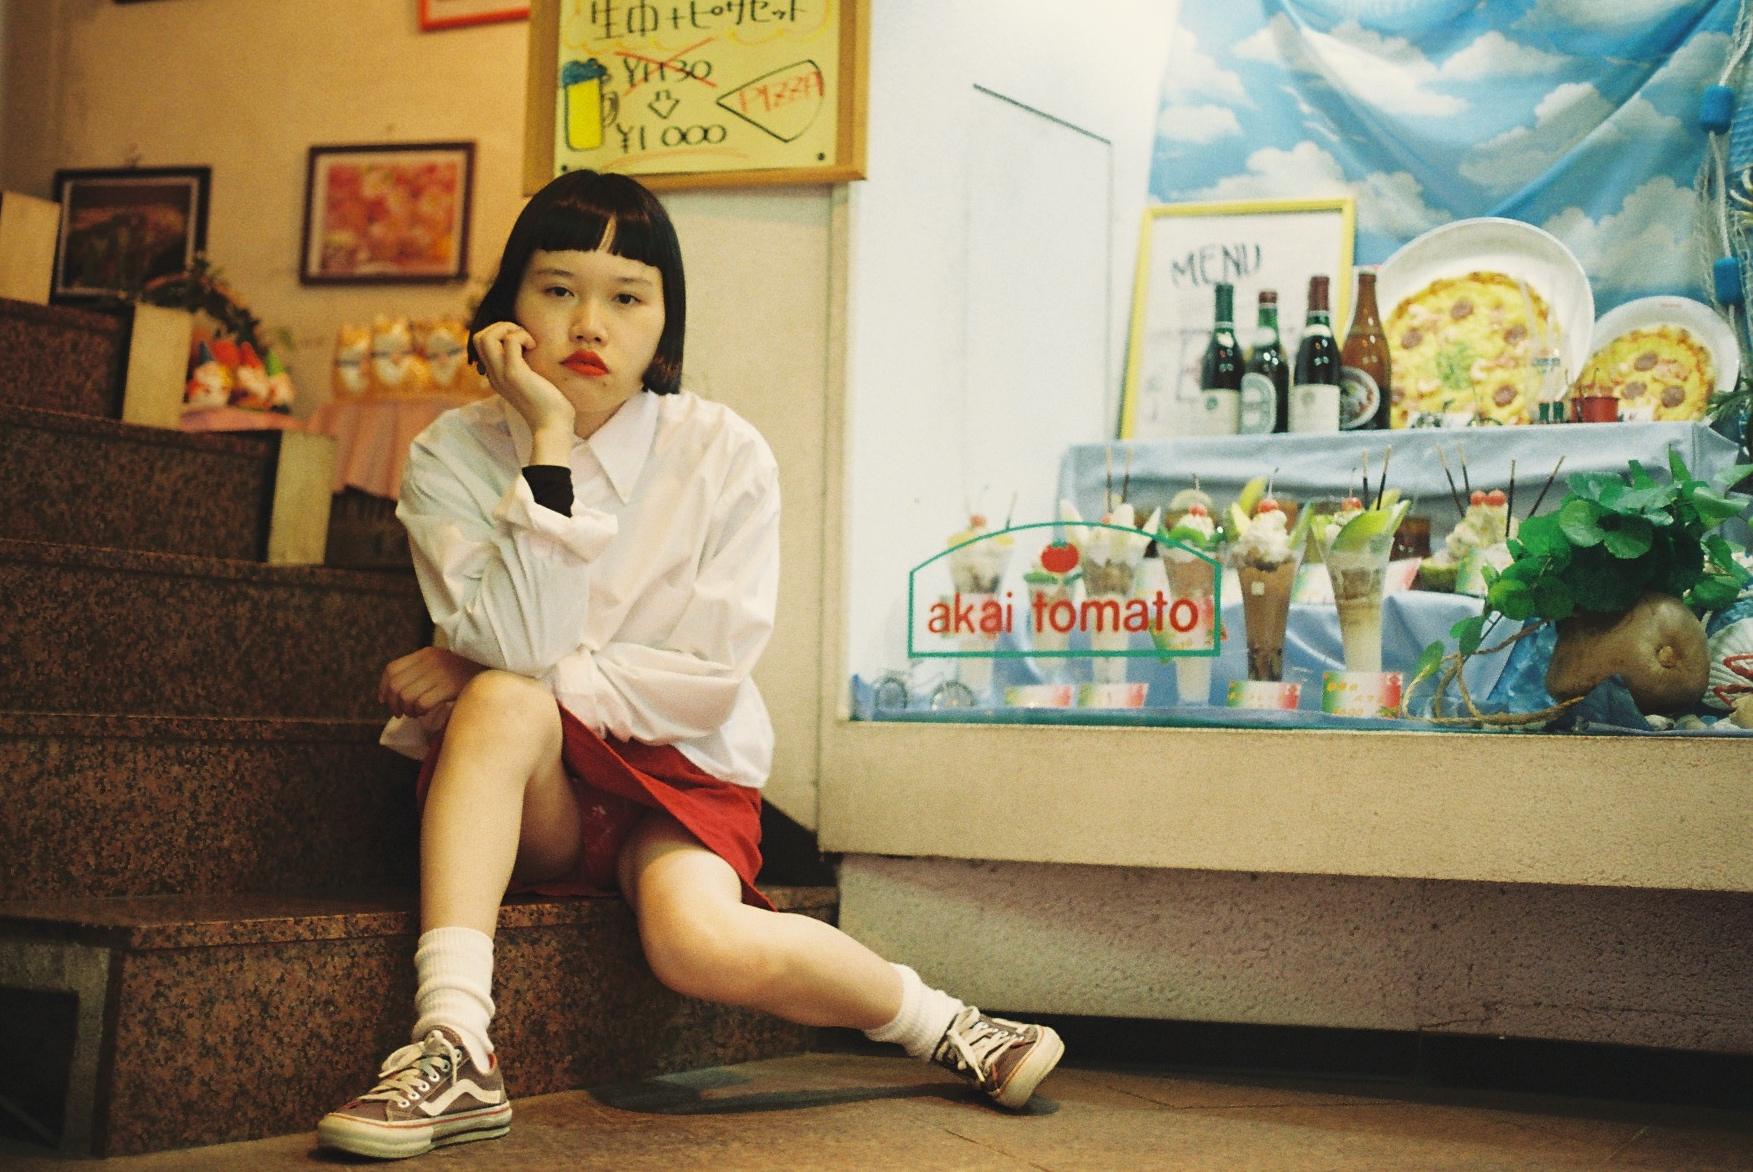 Oh boy:ファッションと女性らしさ - By Sarah Yung